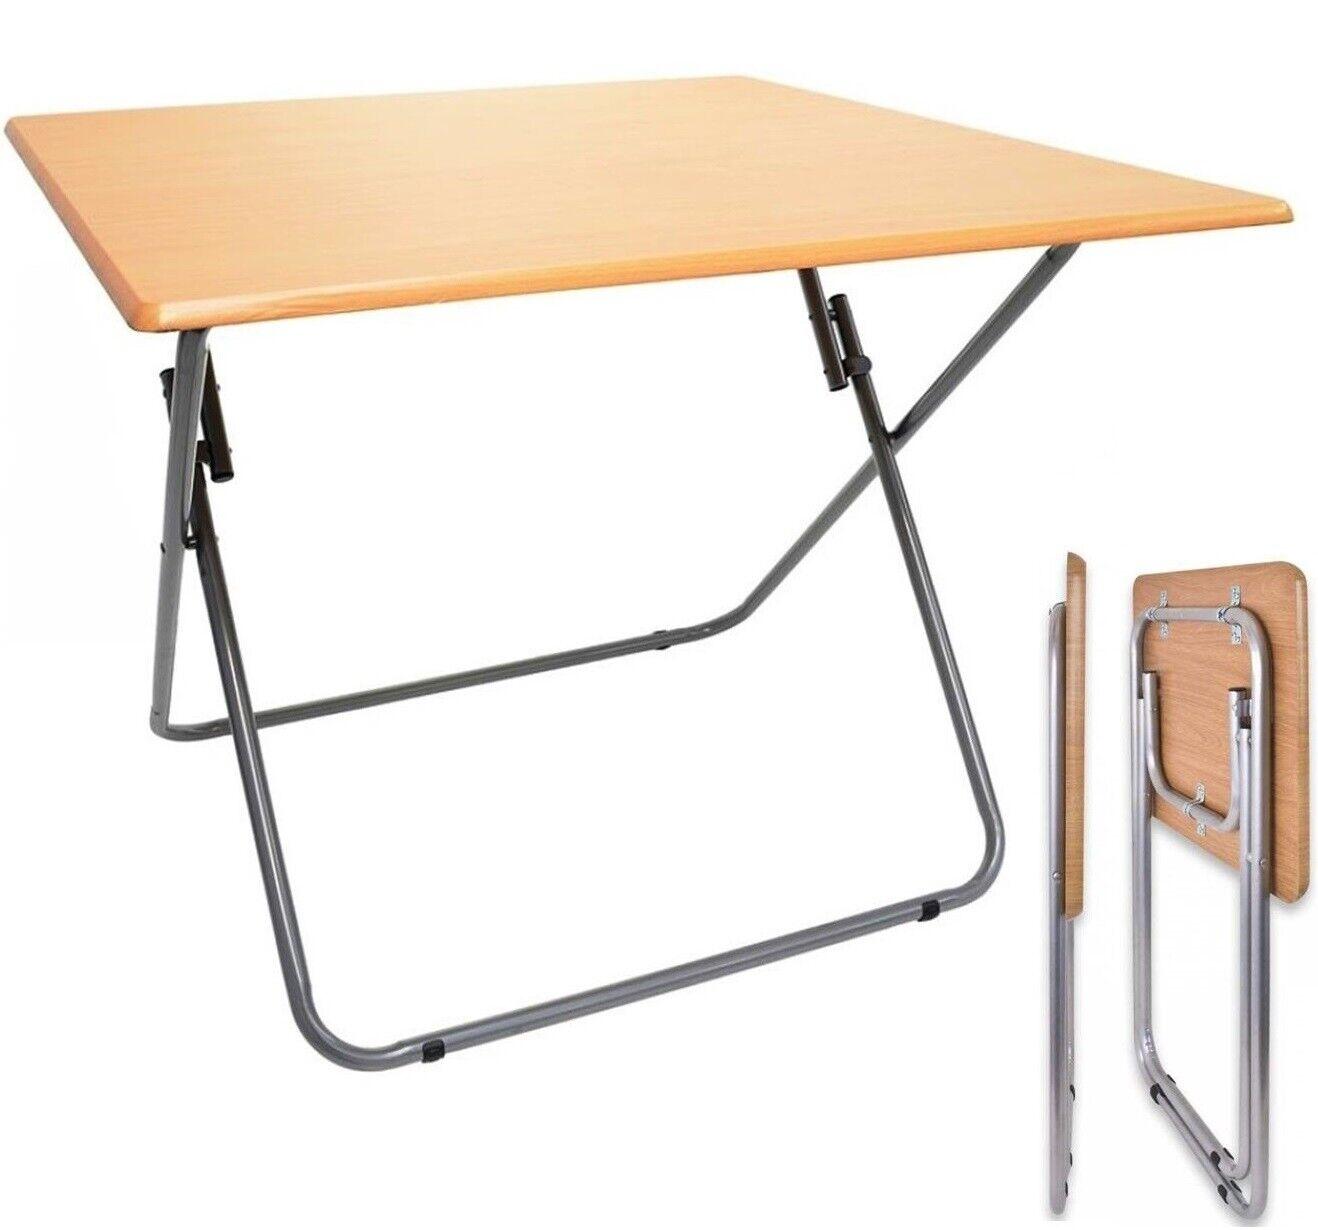 Mesa plegable portátil para Camping Terraza Jardín Metal y madera 70x60x60cm